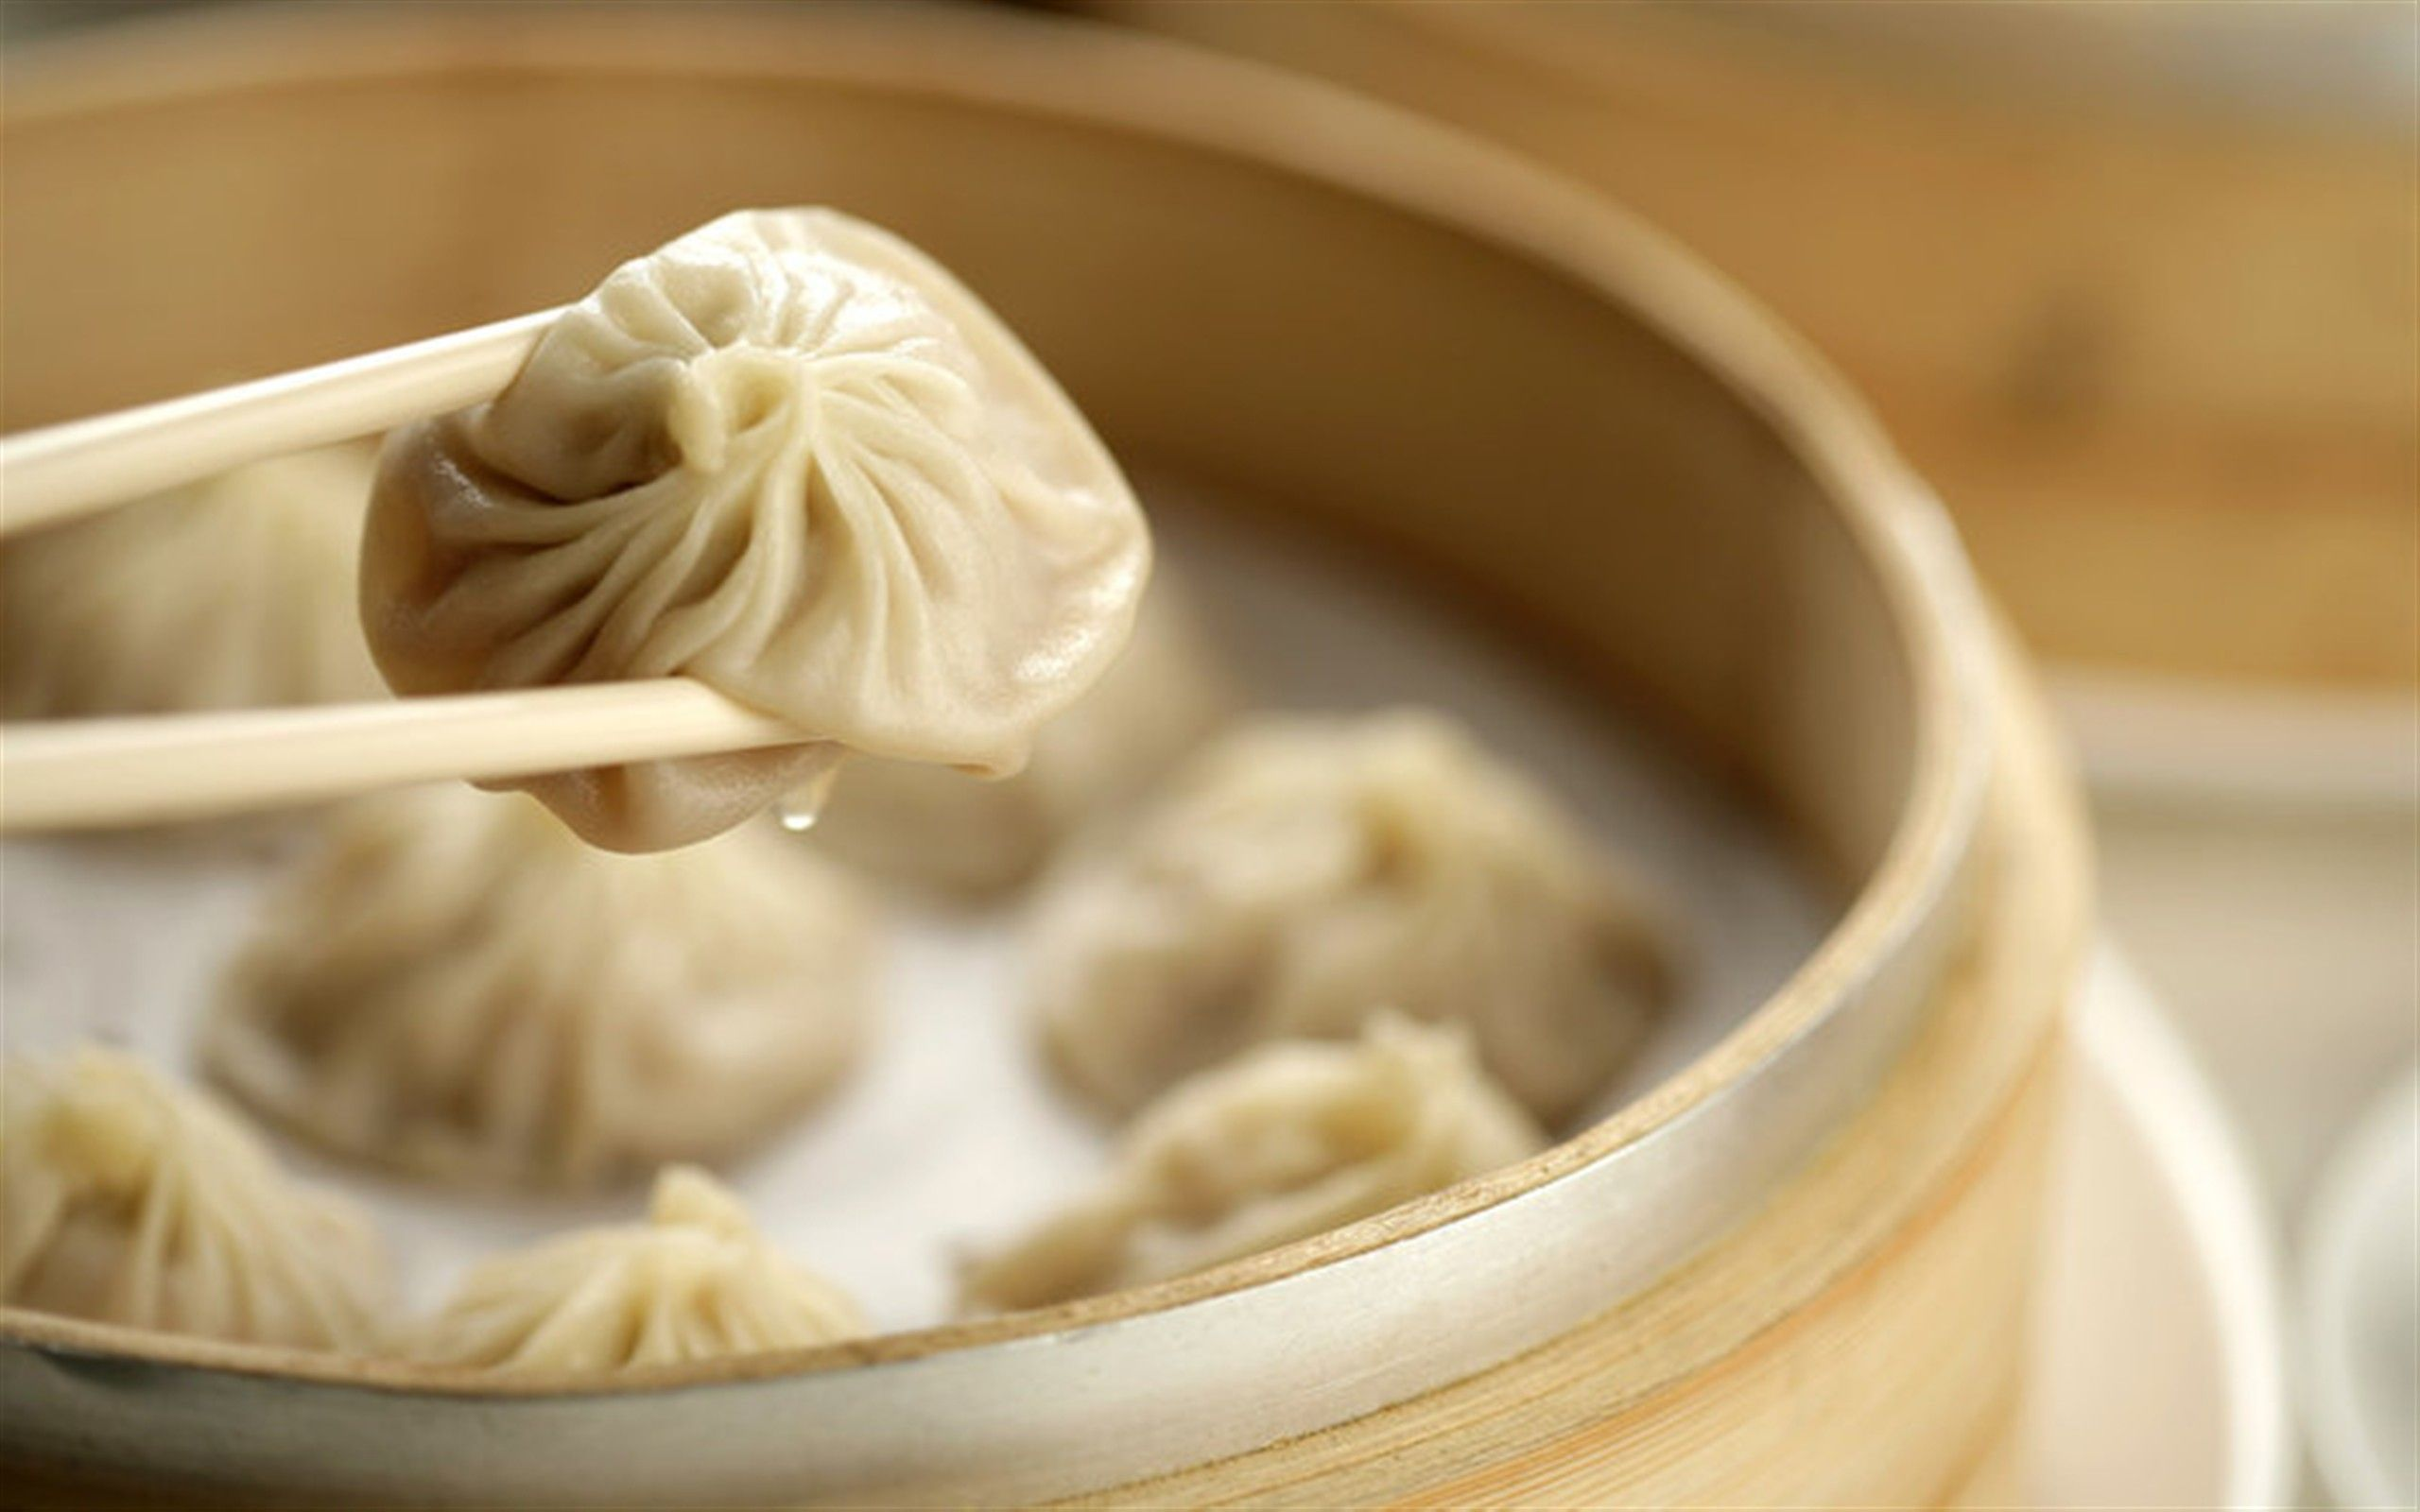 Tasty Chinese Dumplings Food Photo Wallpaper Desktop Free Hd